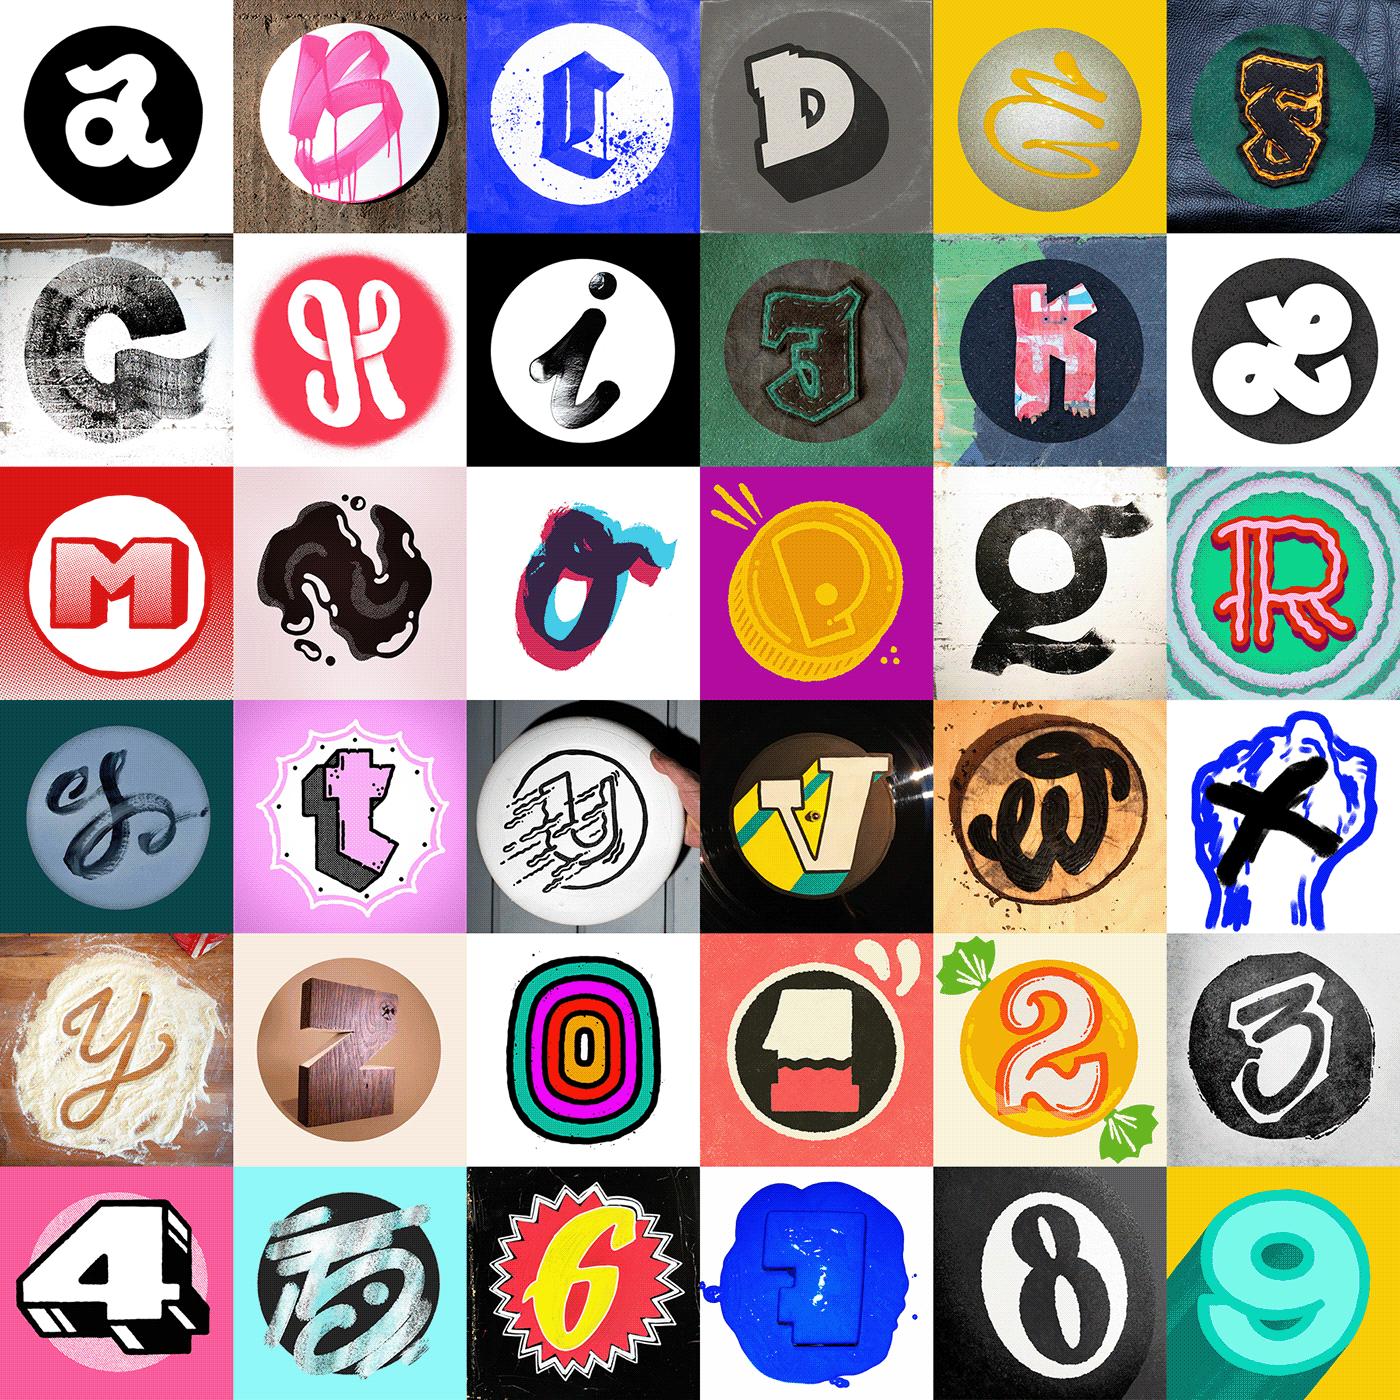 Handlettering instagram lettering letters paintbrush patch skateboarding type wood